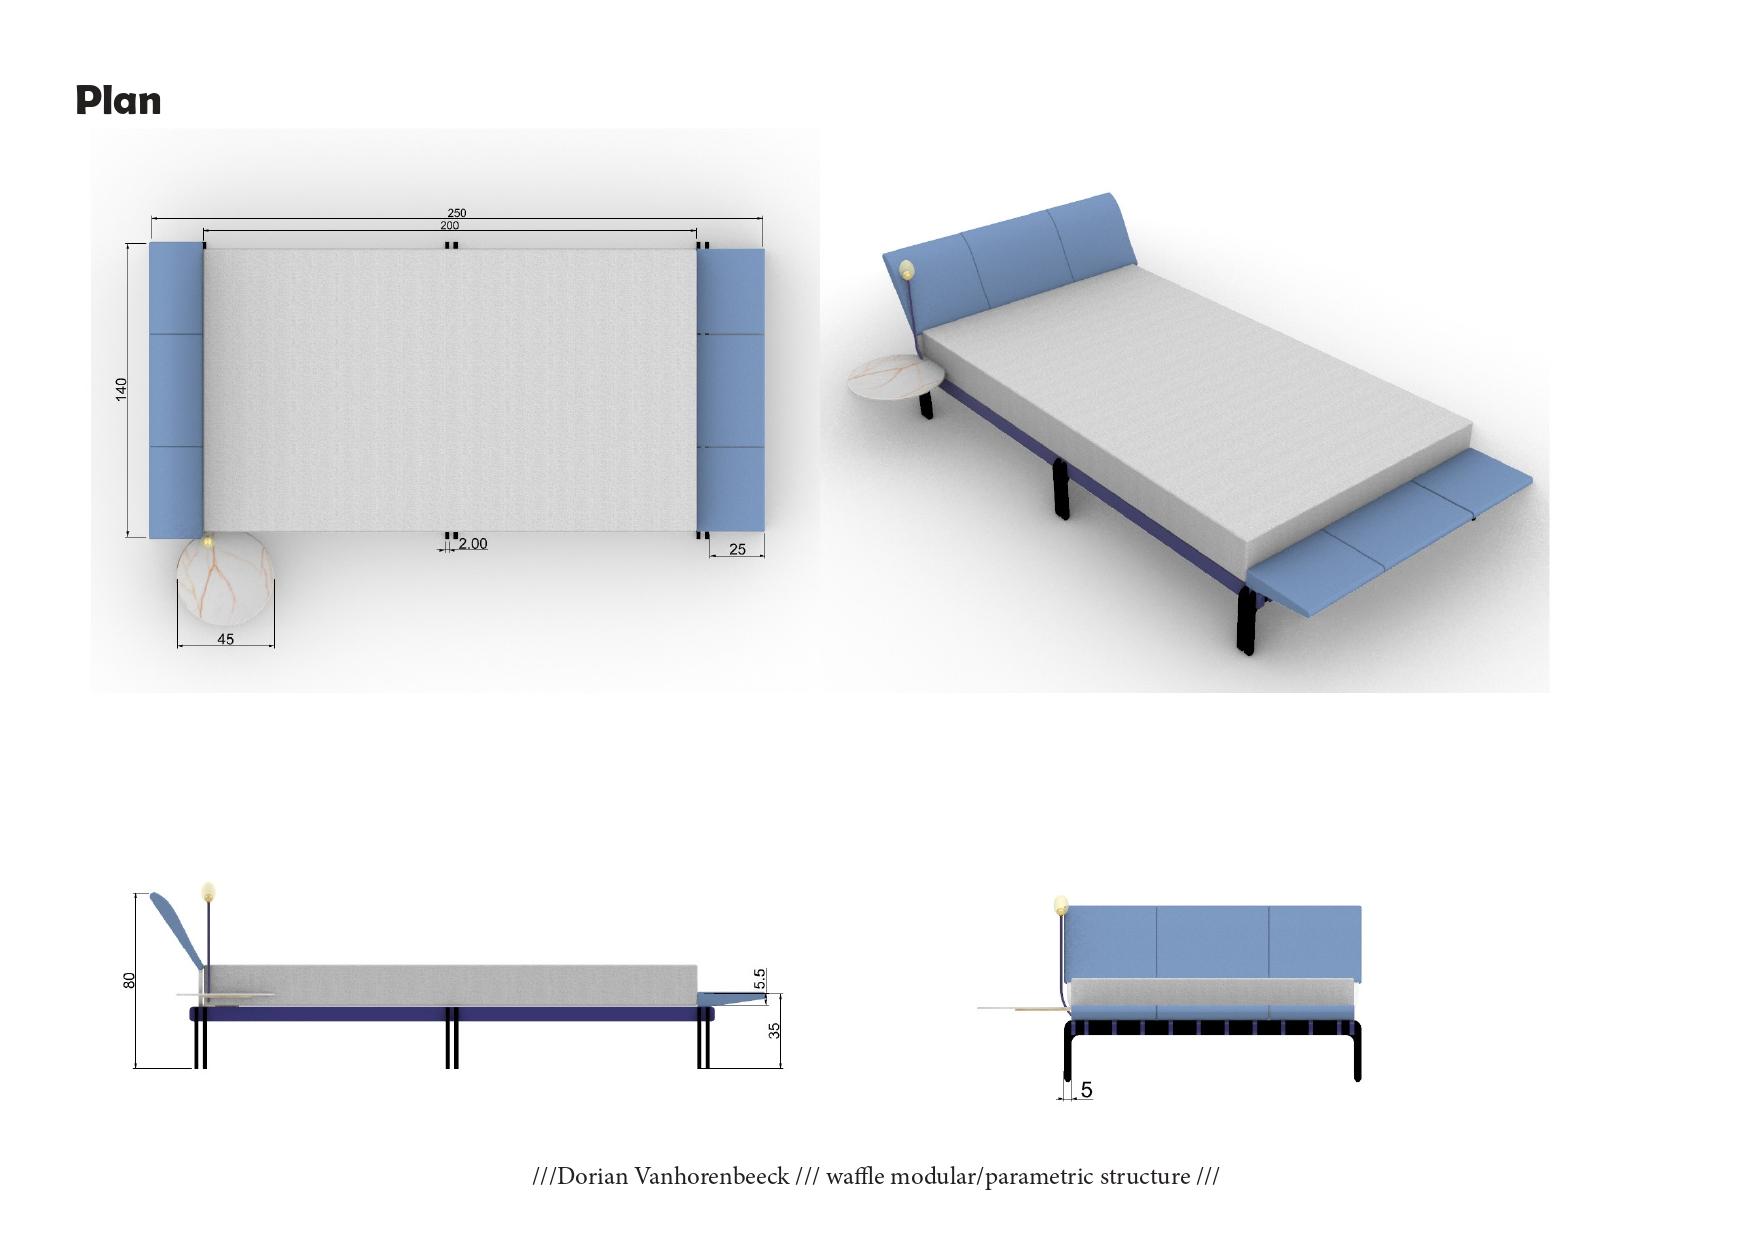 Livret Waffle modular-parametric Structure Dorian Vanhorenbeeck_page-0014